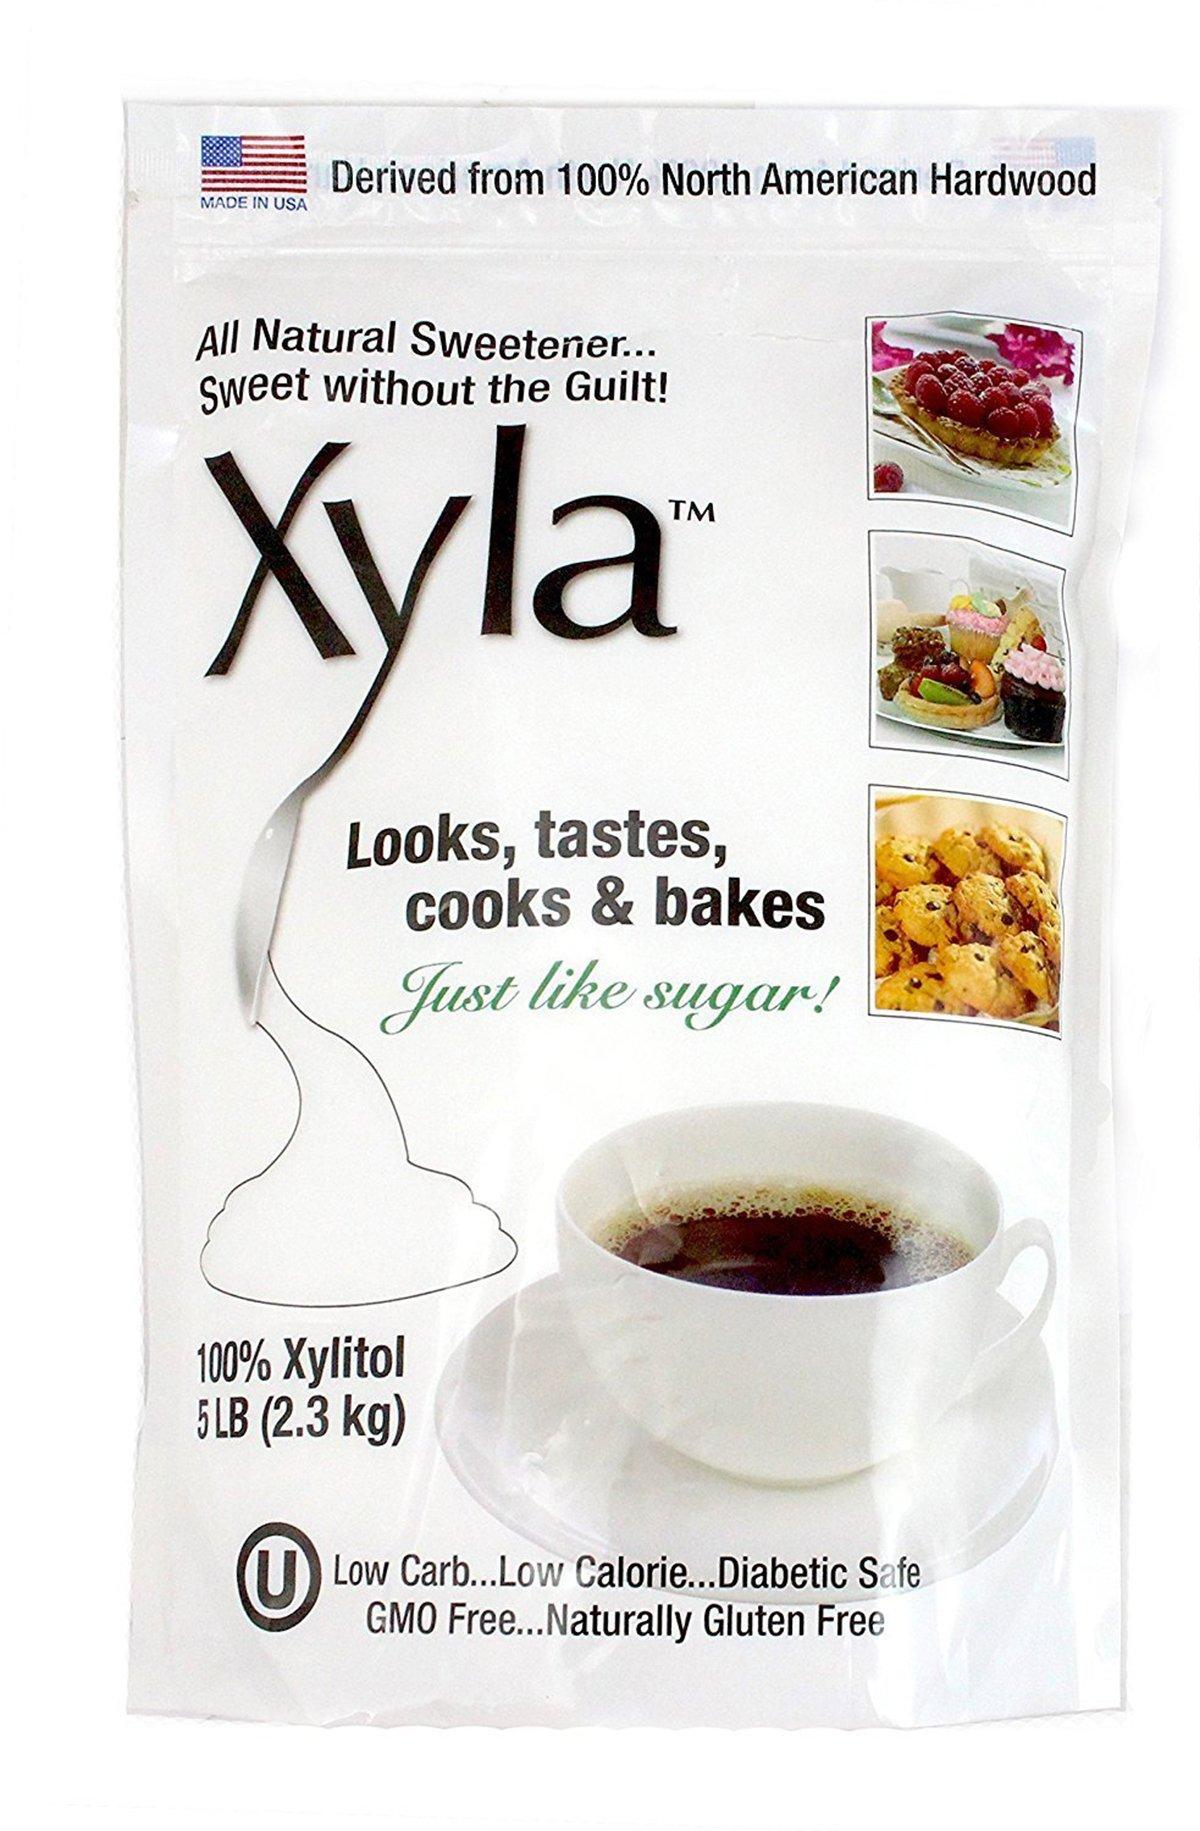 Xyla Xylitol North American Birch Xylitol Sweetener 5 Pound Bag